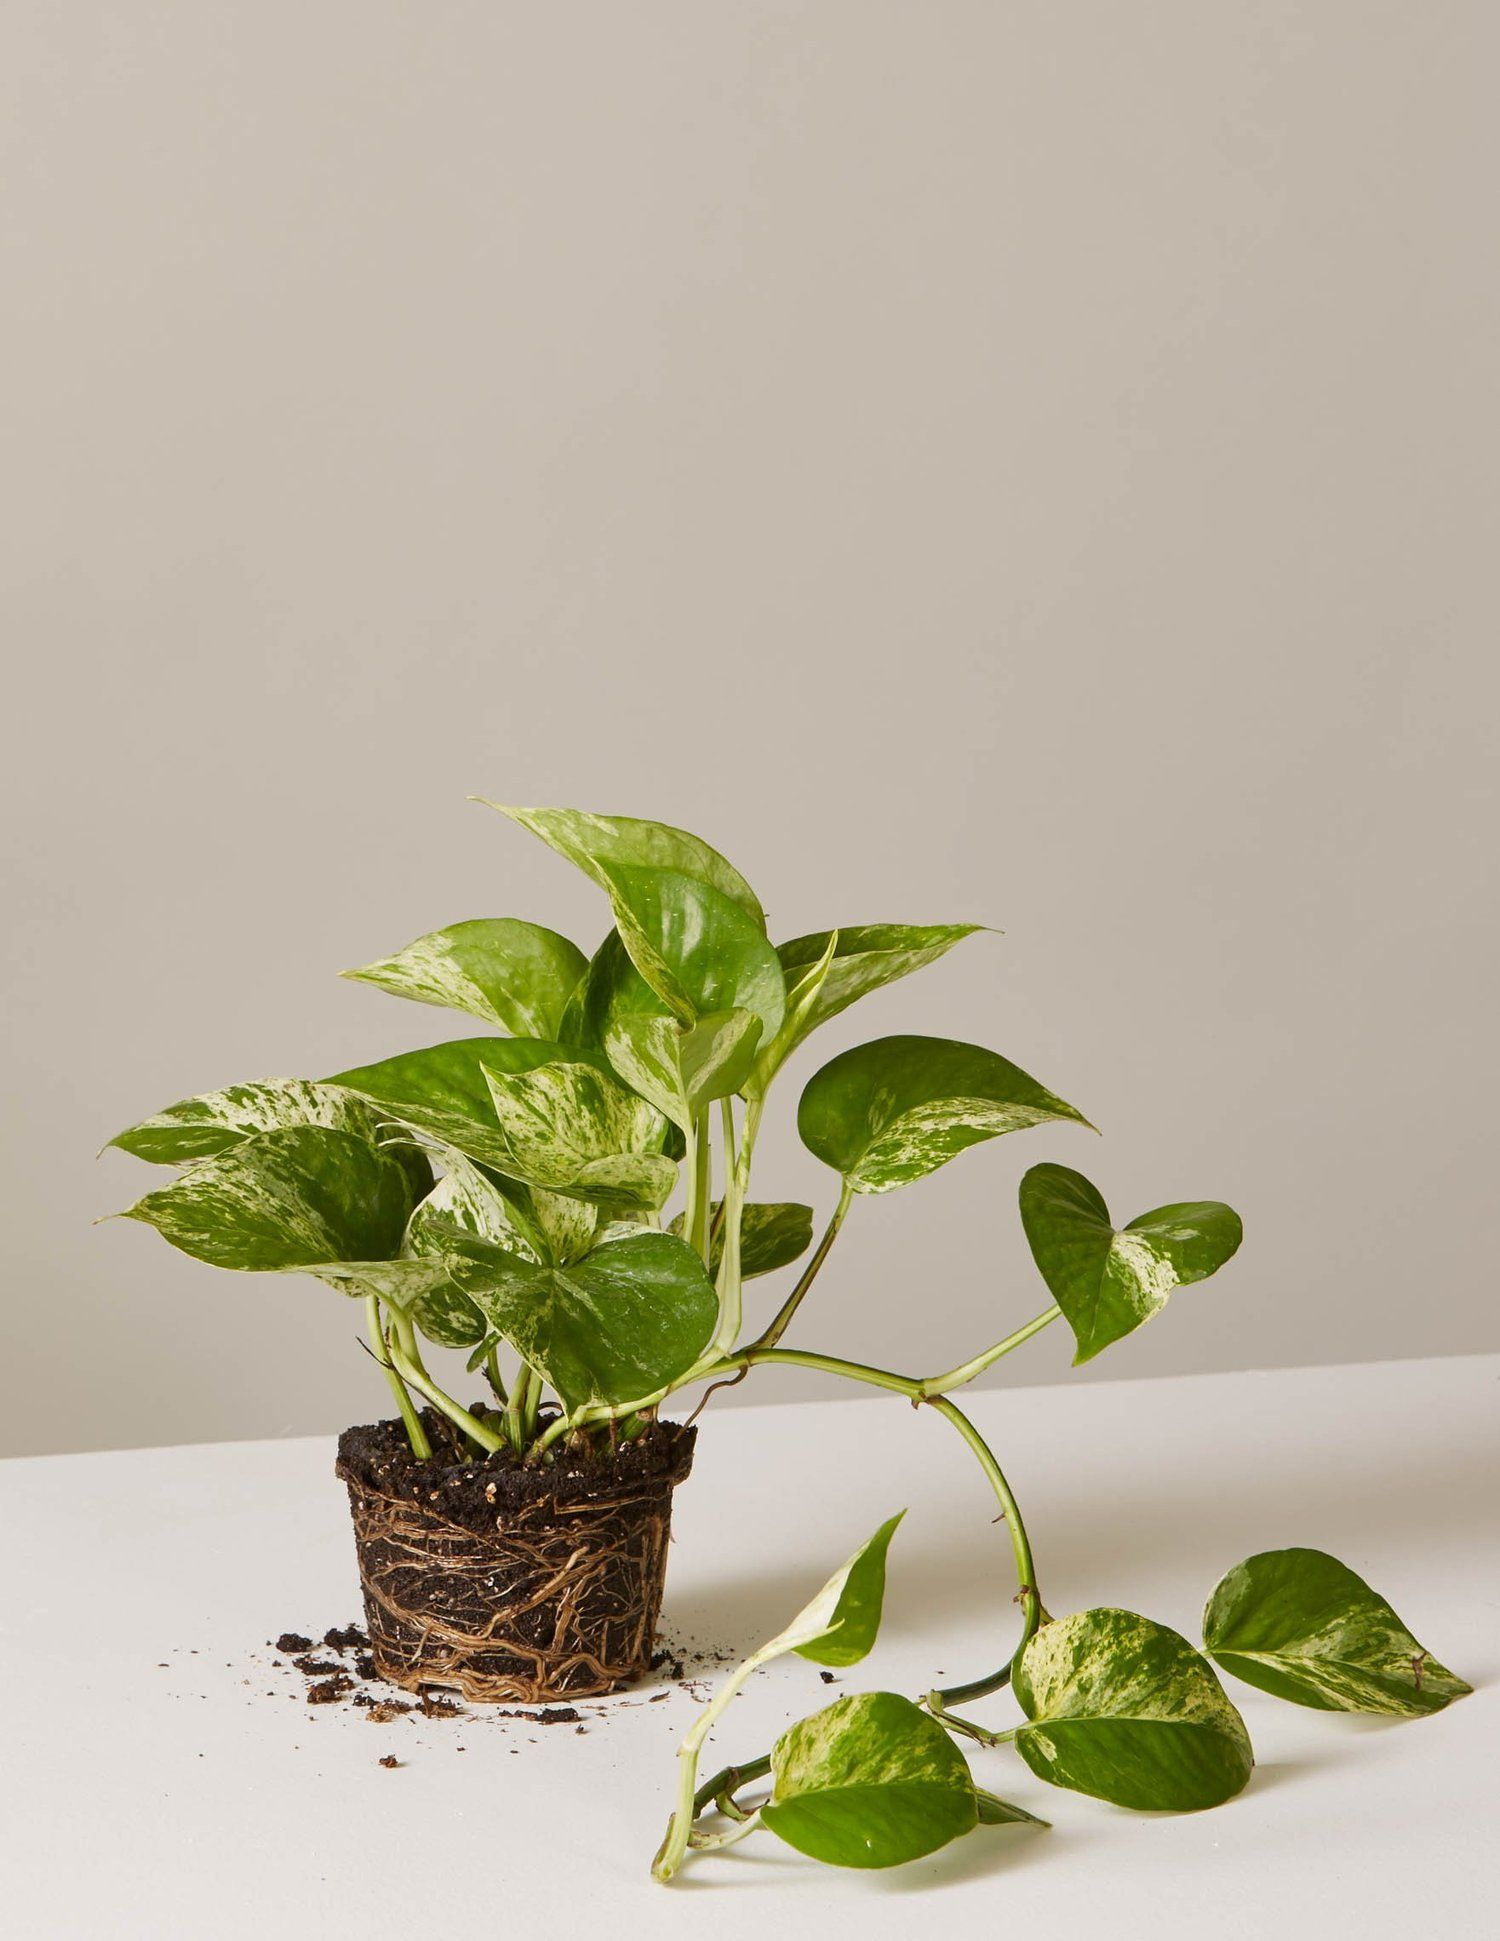 Shop Houseplants - Indoor Plants, Delivered